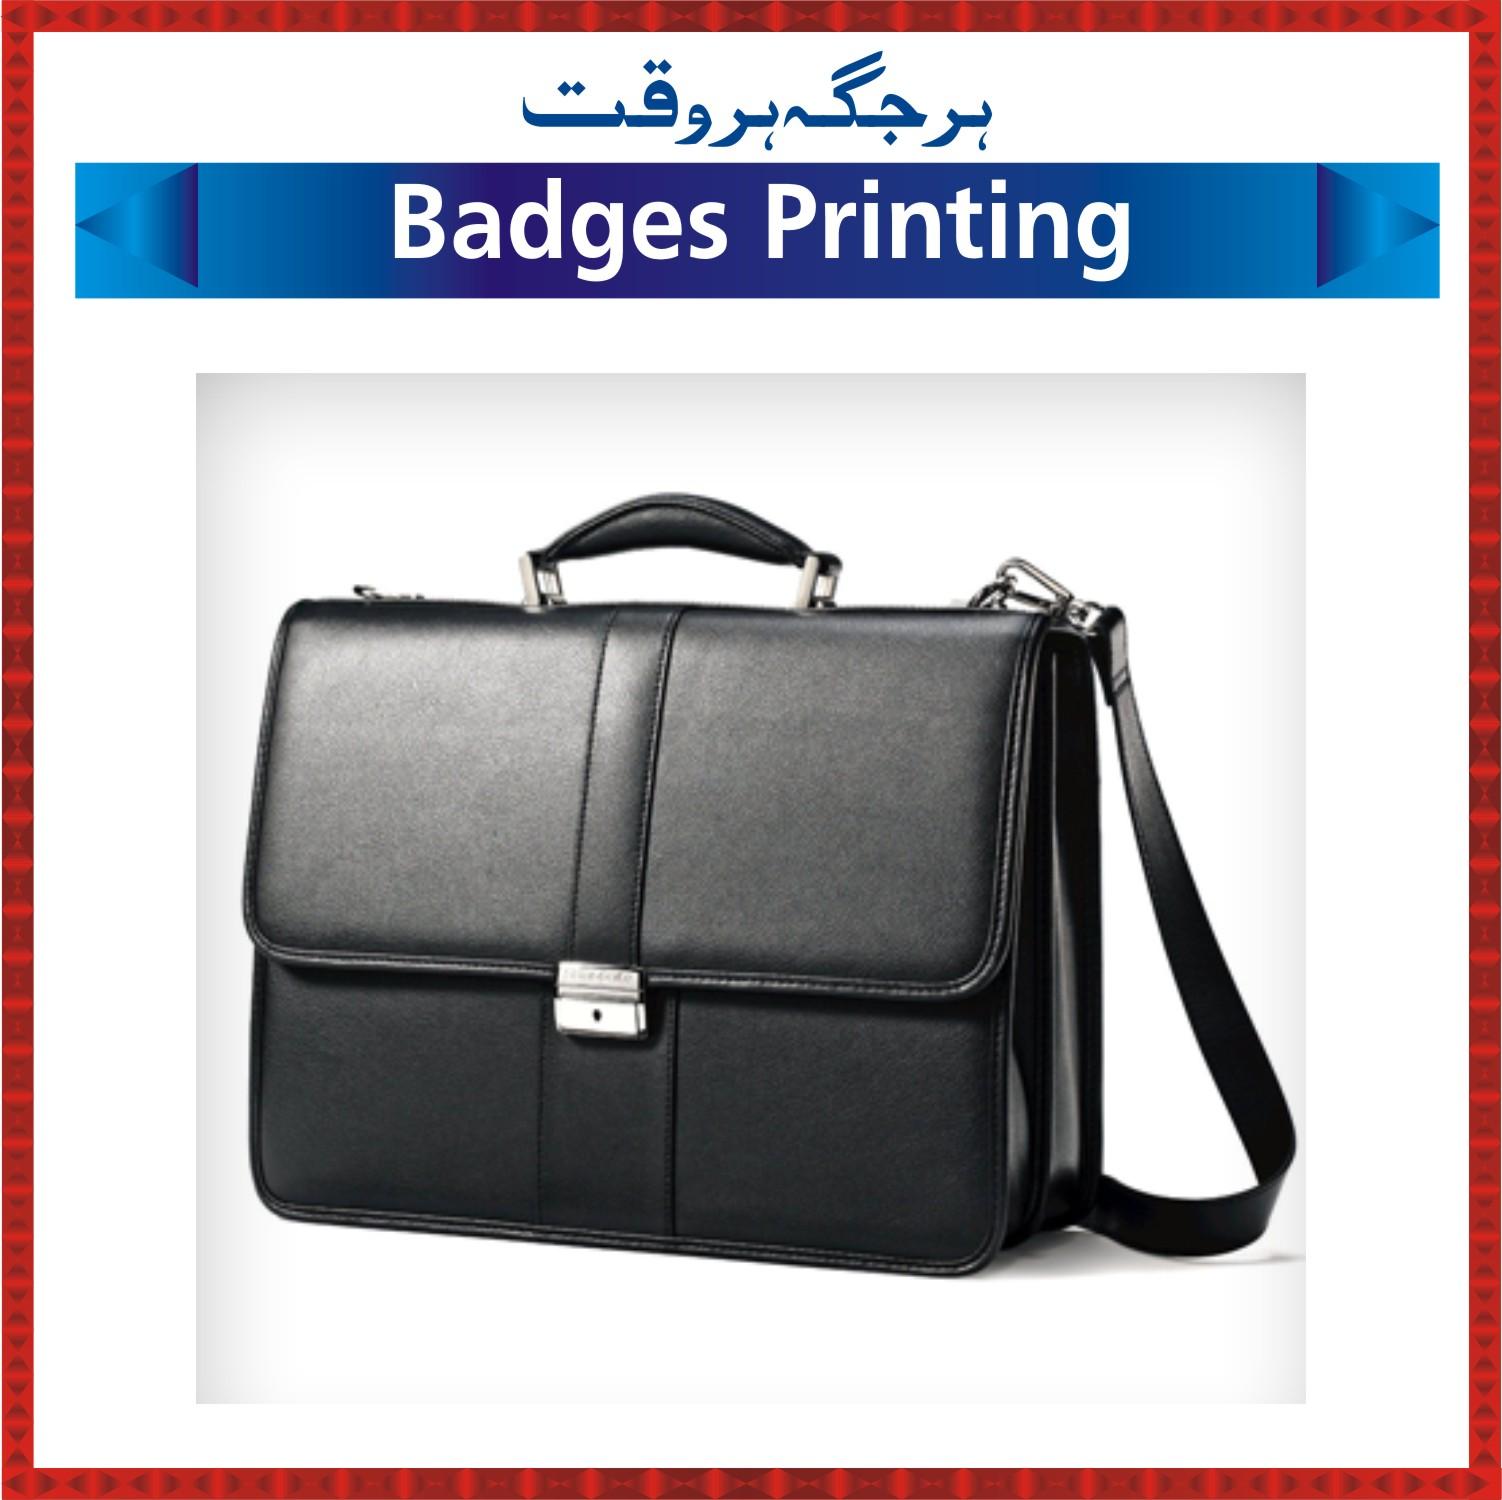 Badges-Printing